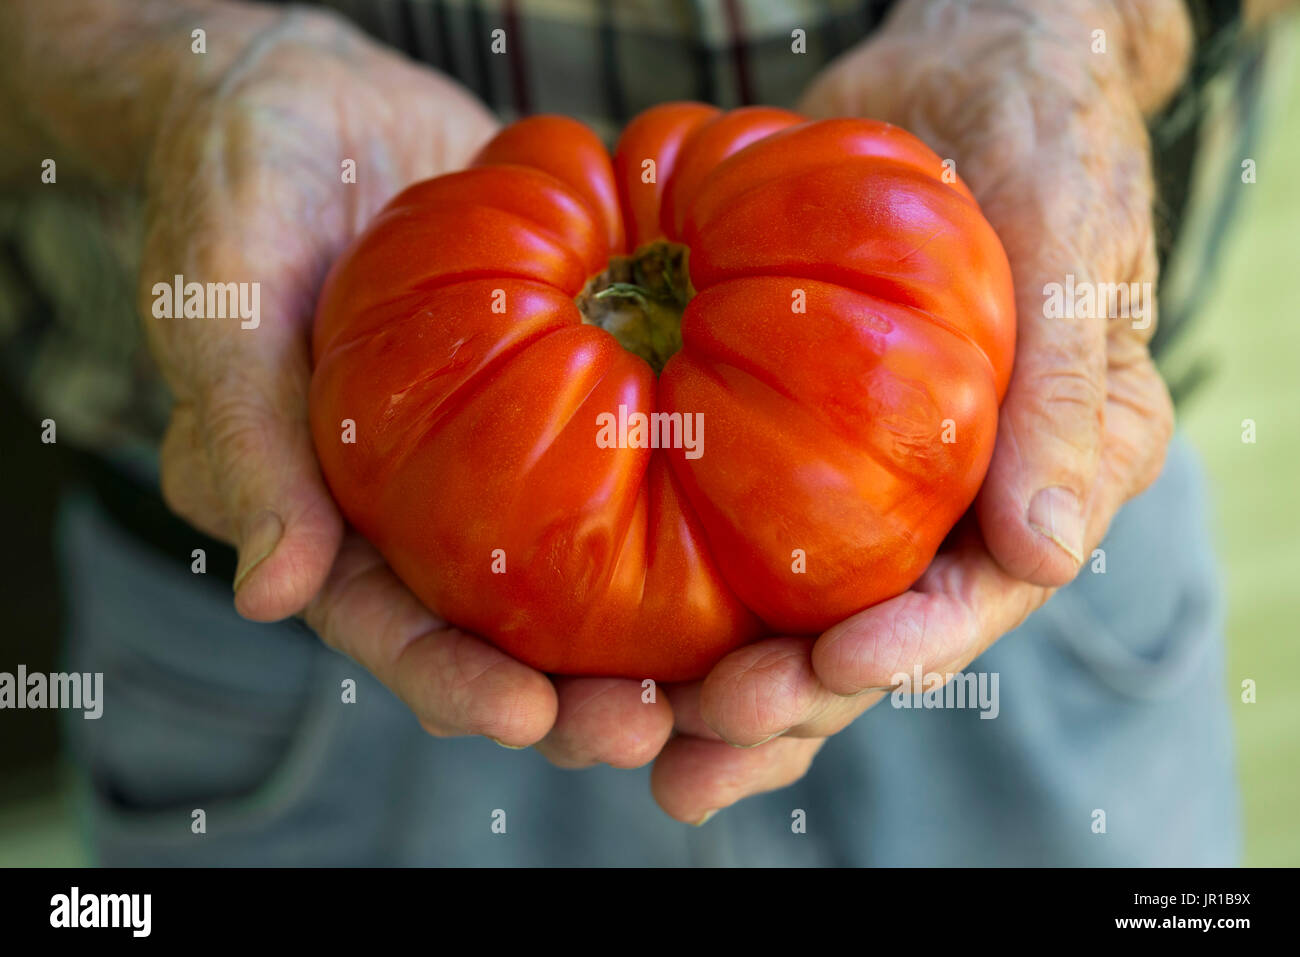 Heirloom Tomato - Stock Image